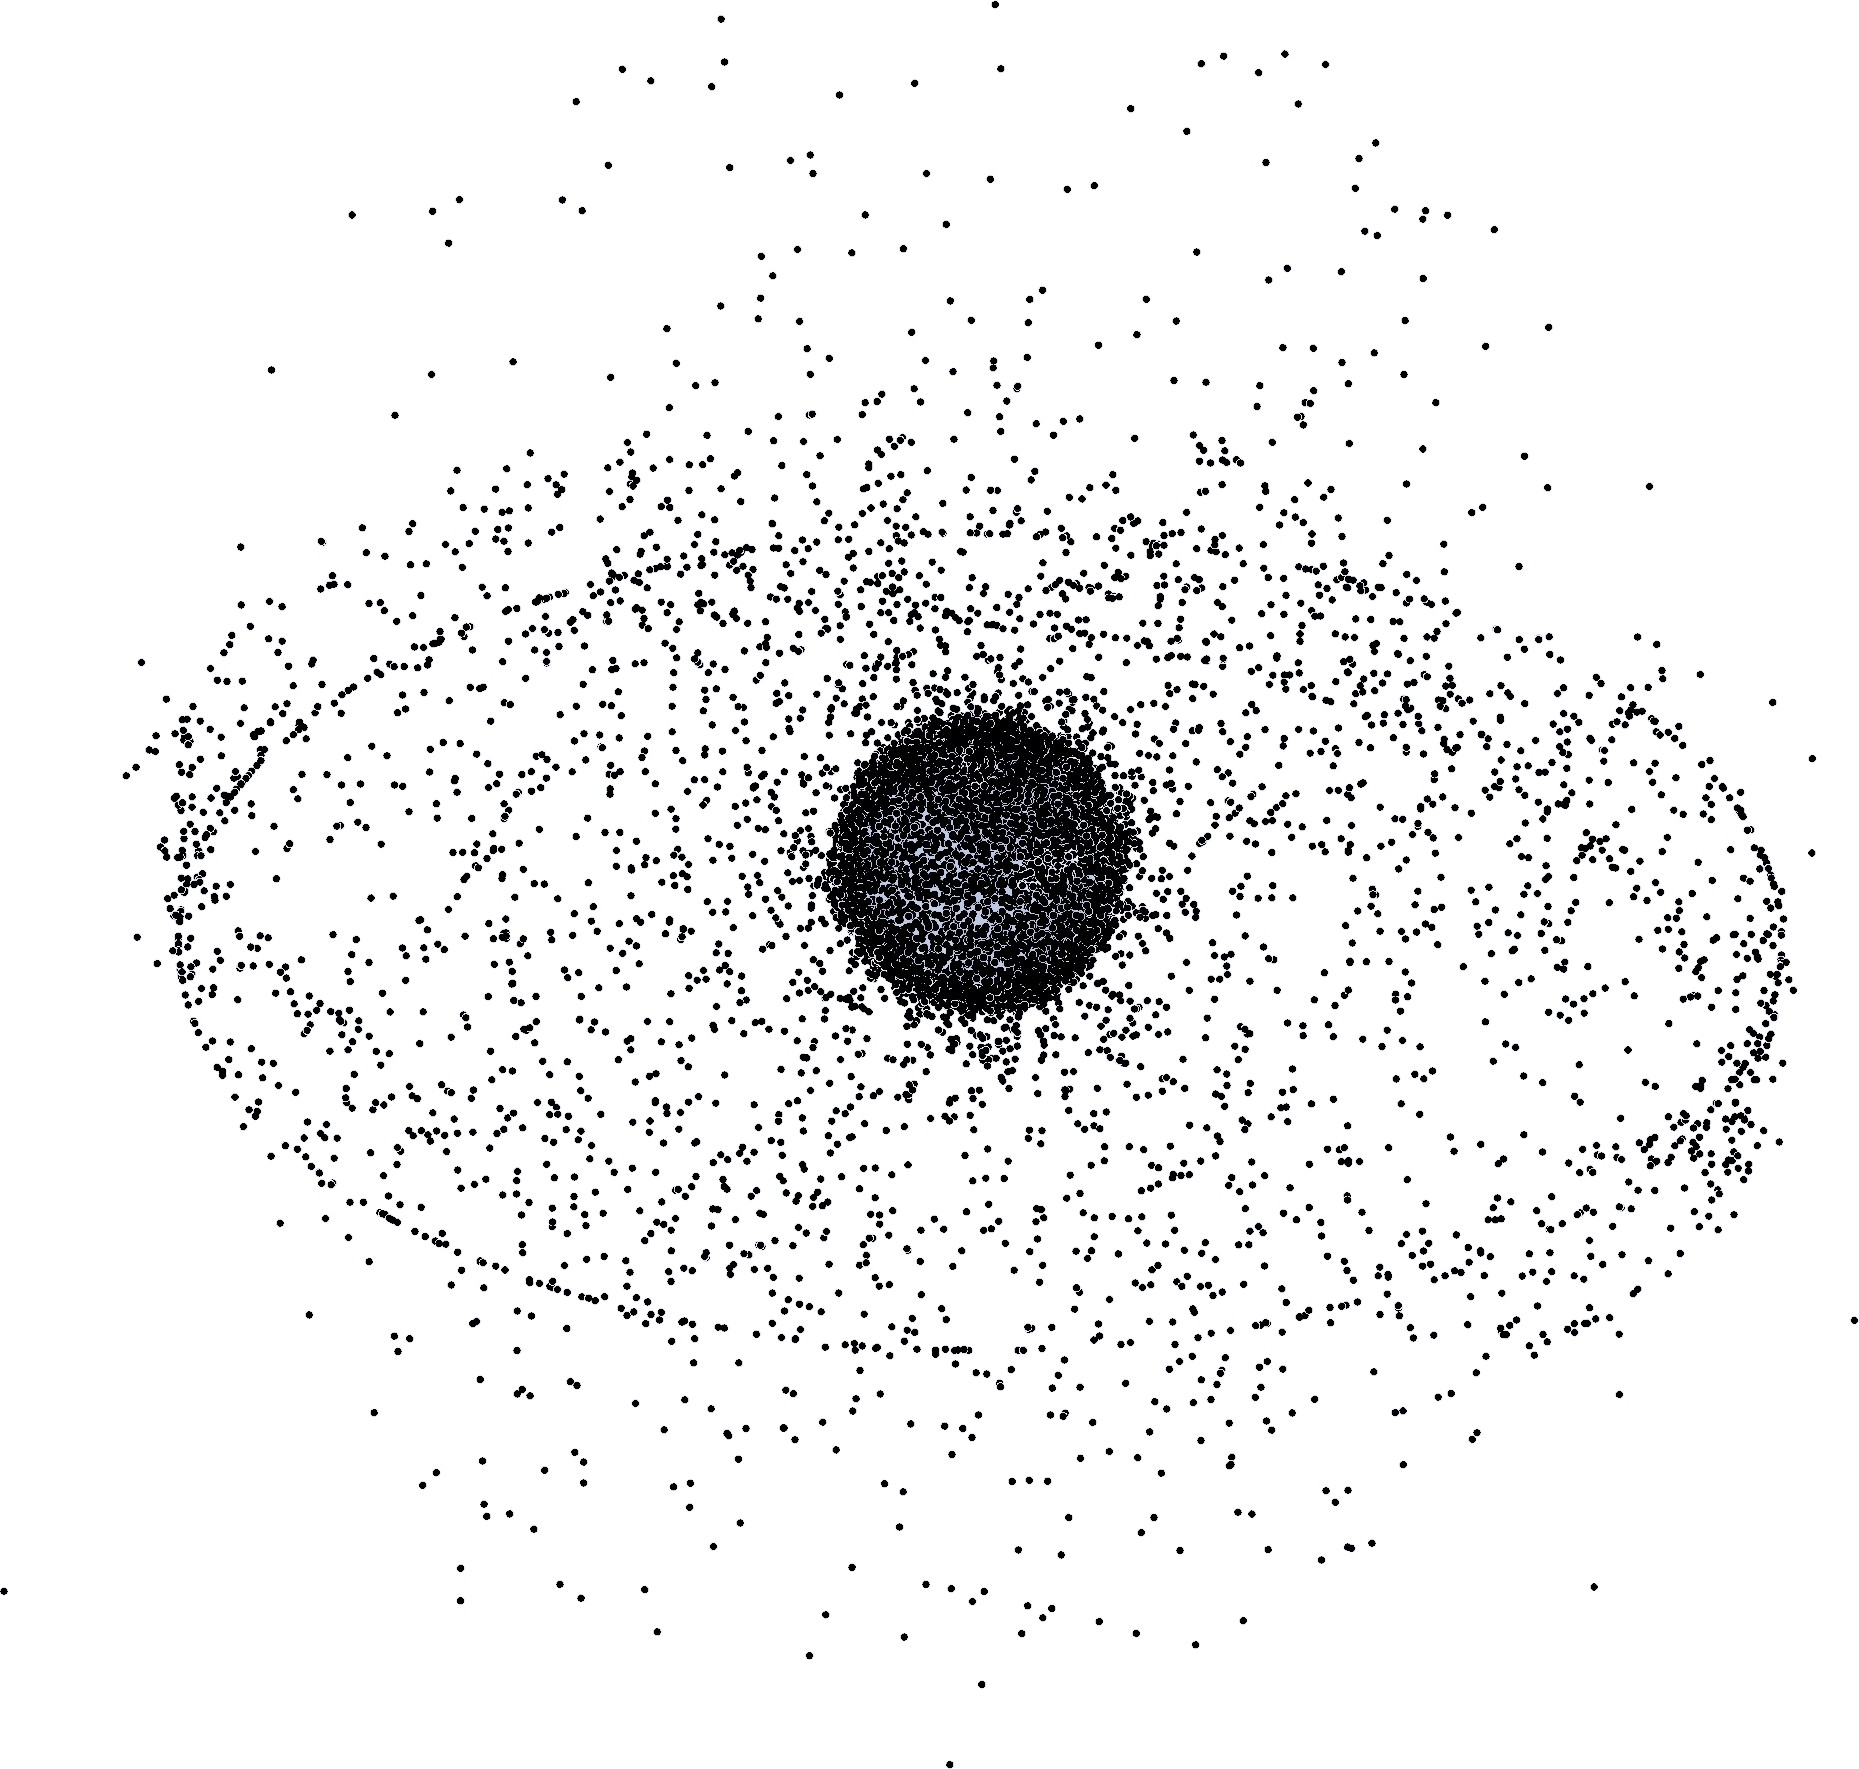 Smdc History On Orbit